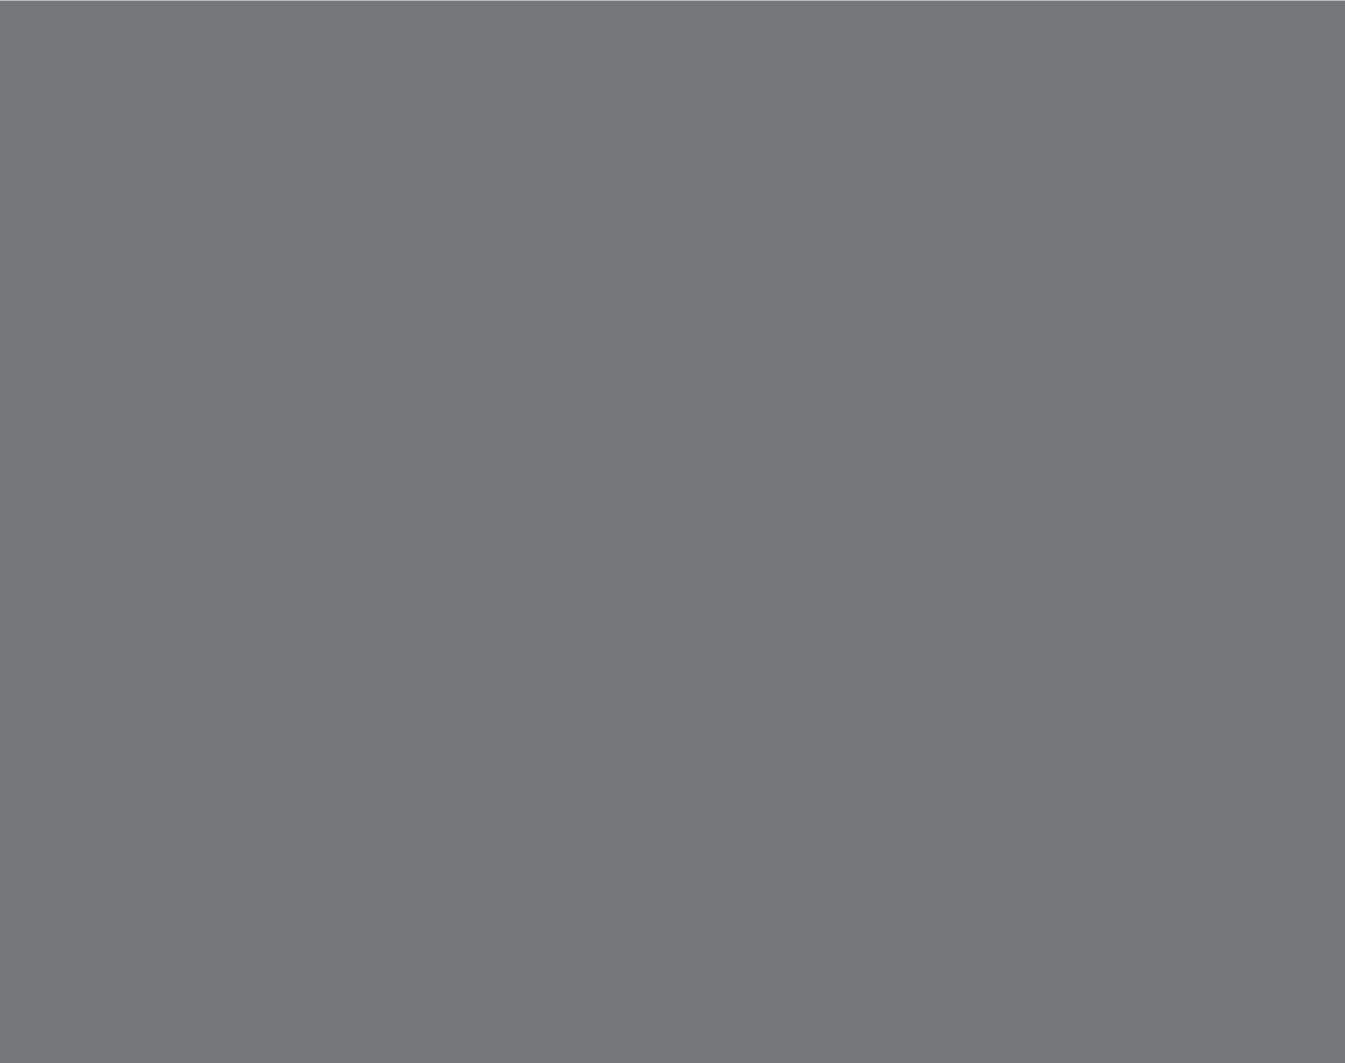 Pantone  Cool Gray 9 C  CMYK: 30 / 22 / 17 / 57  RGB: 117 / 120 / 123  Hex: #75787B